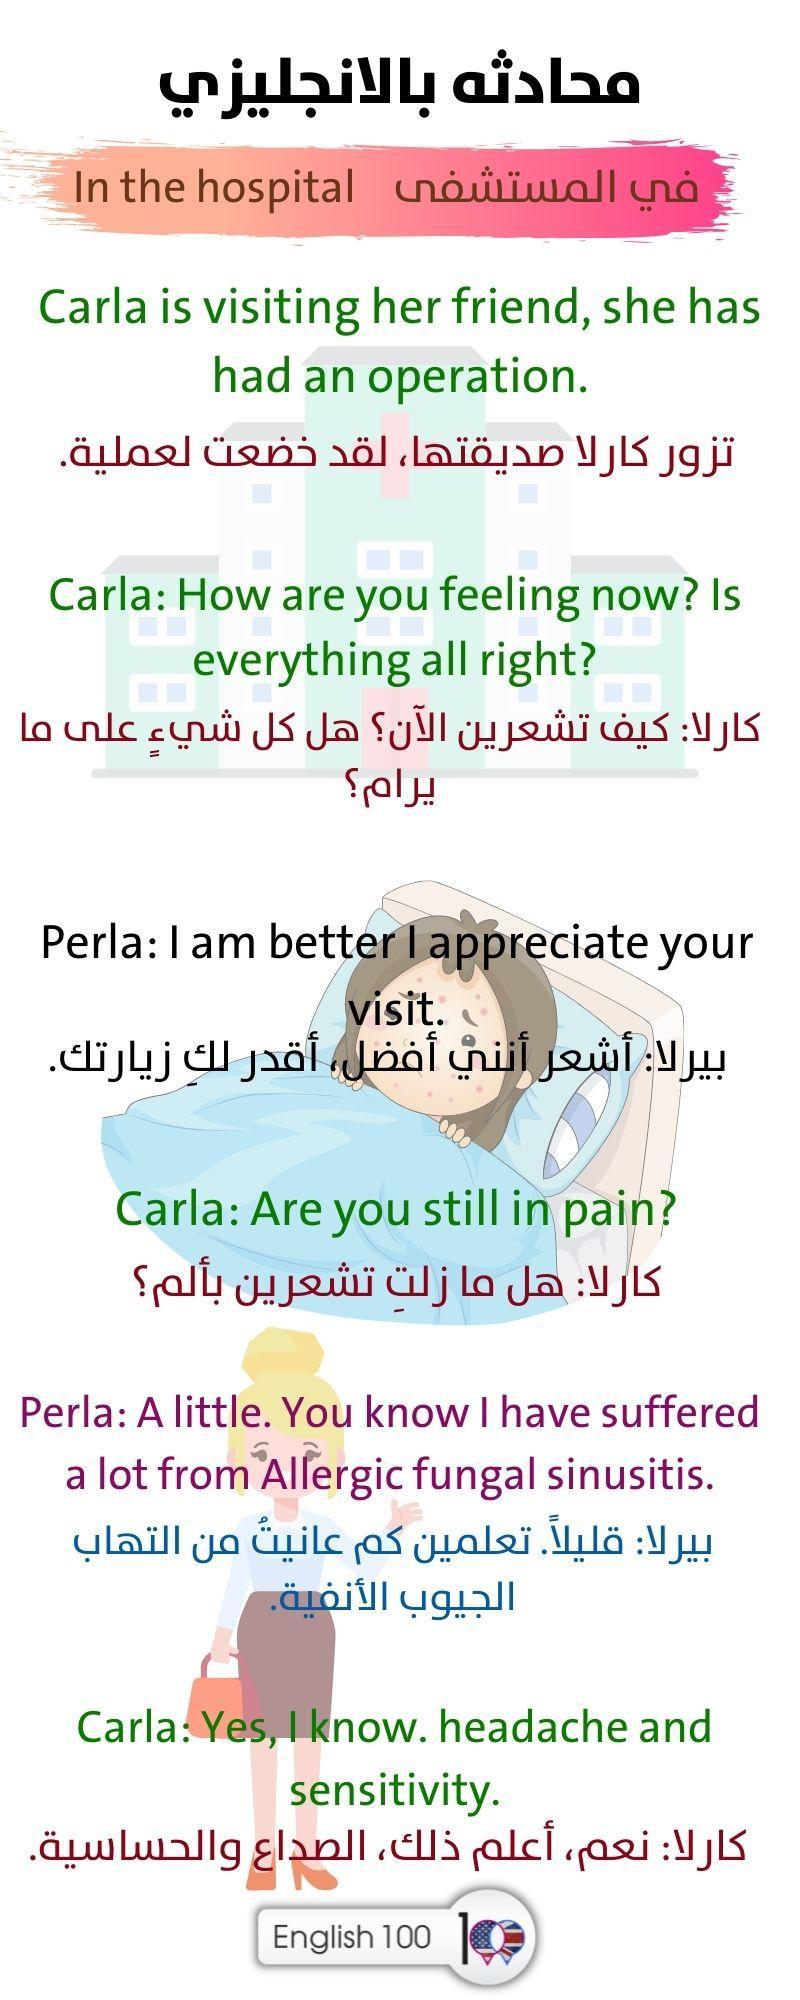 محادثه بالانجليزي A conversation (in English)